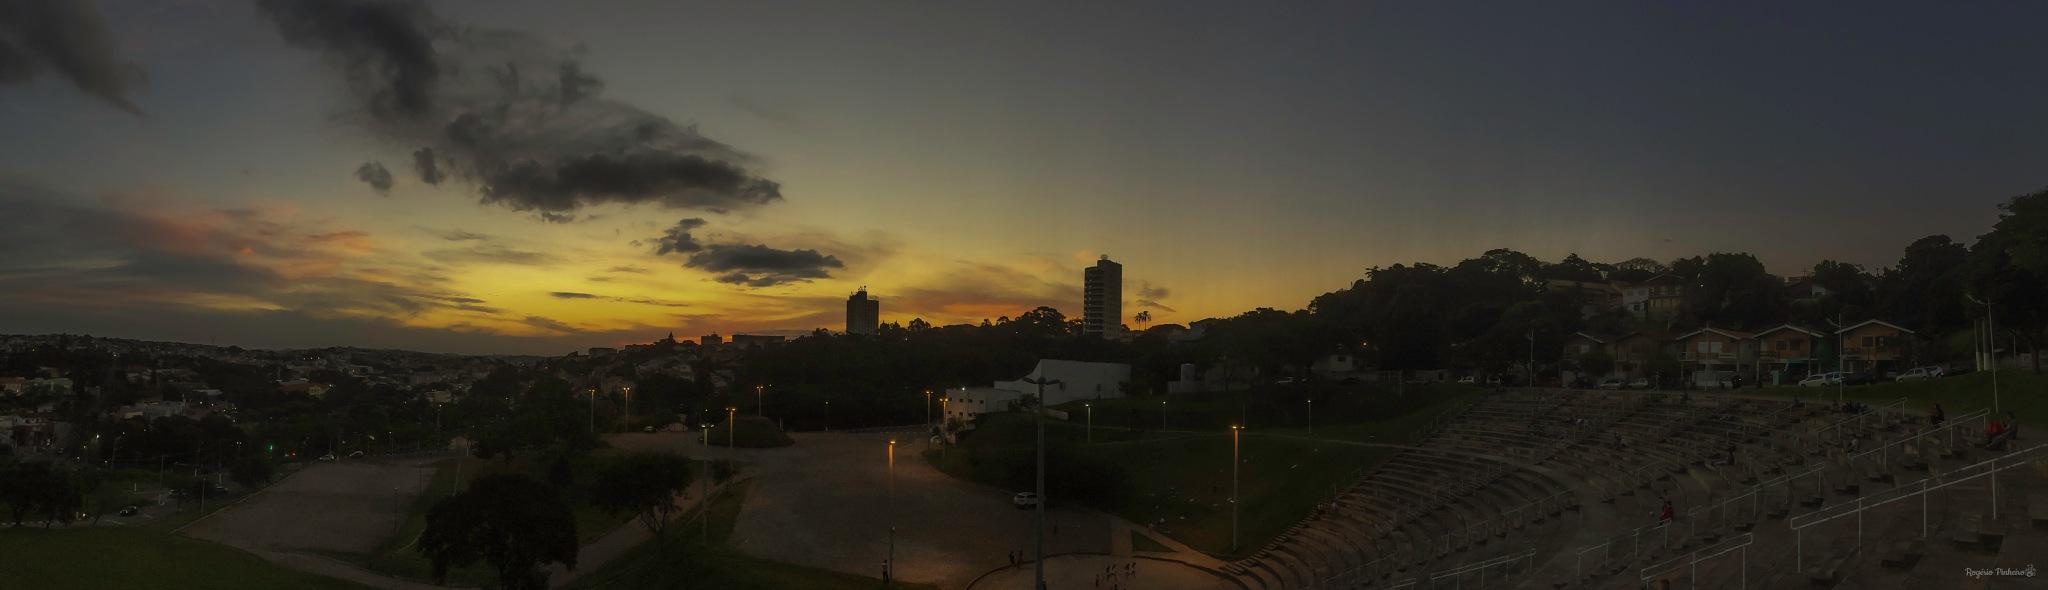 Sunset - Holiday finish by Rogério Pinheiro